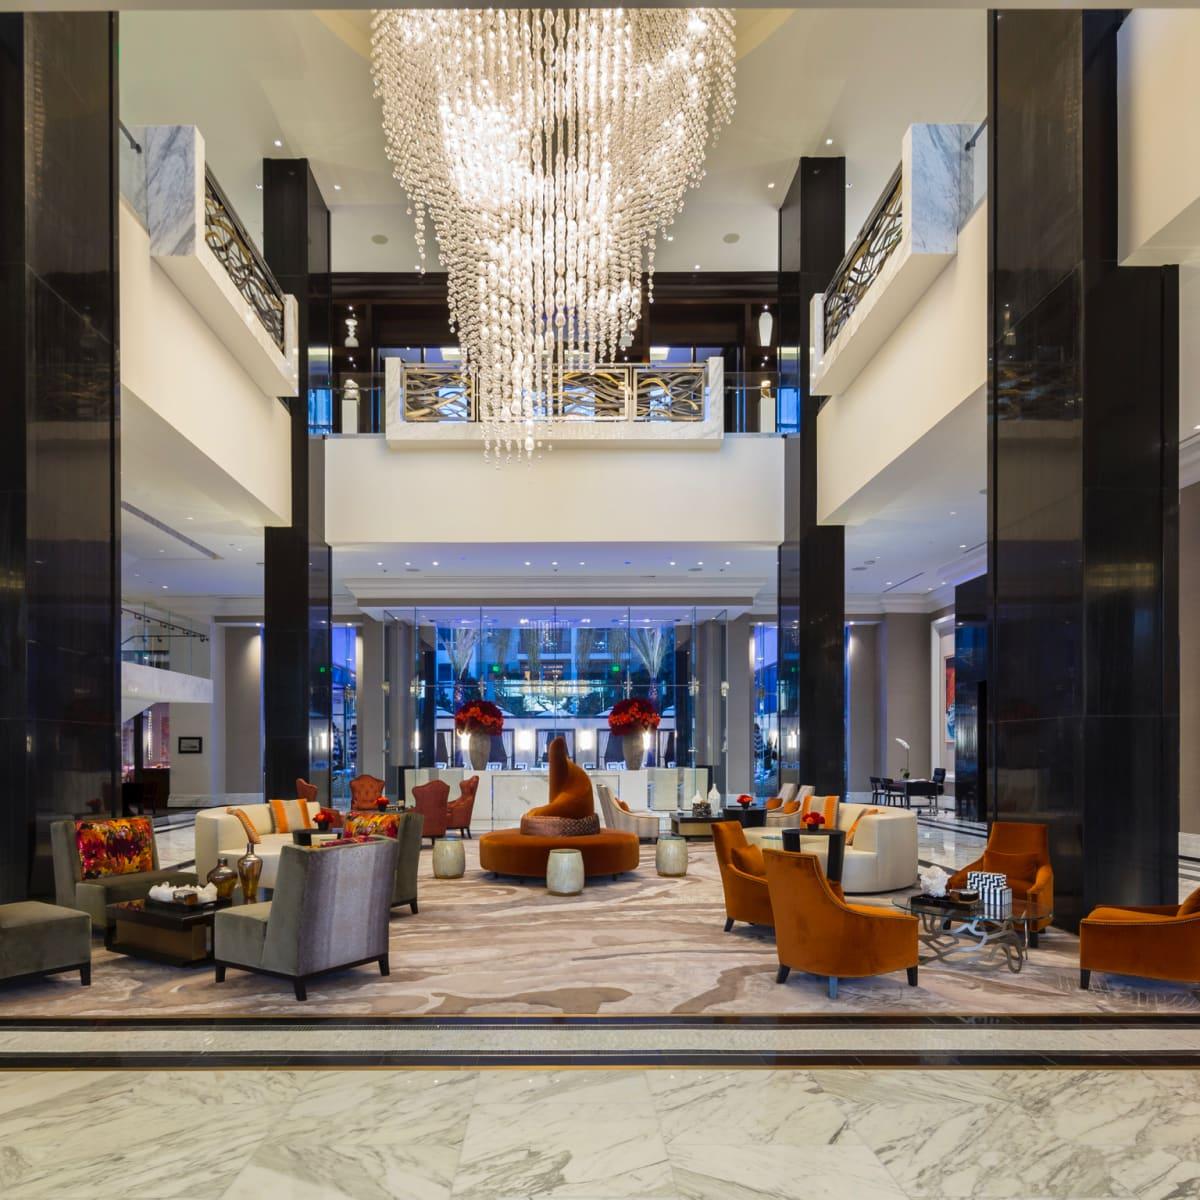 The Post Oak hotel lobby